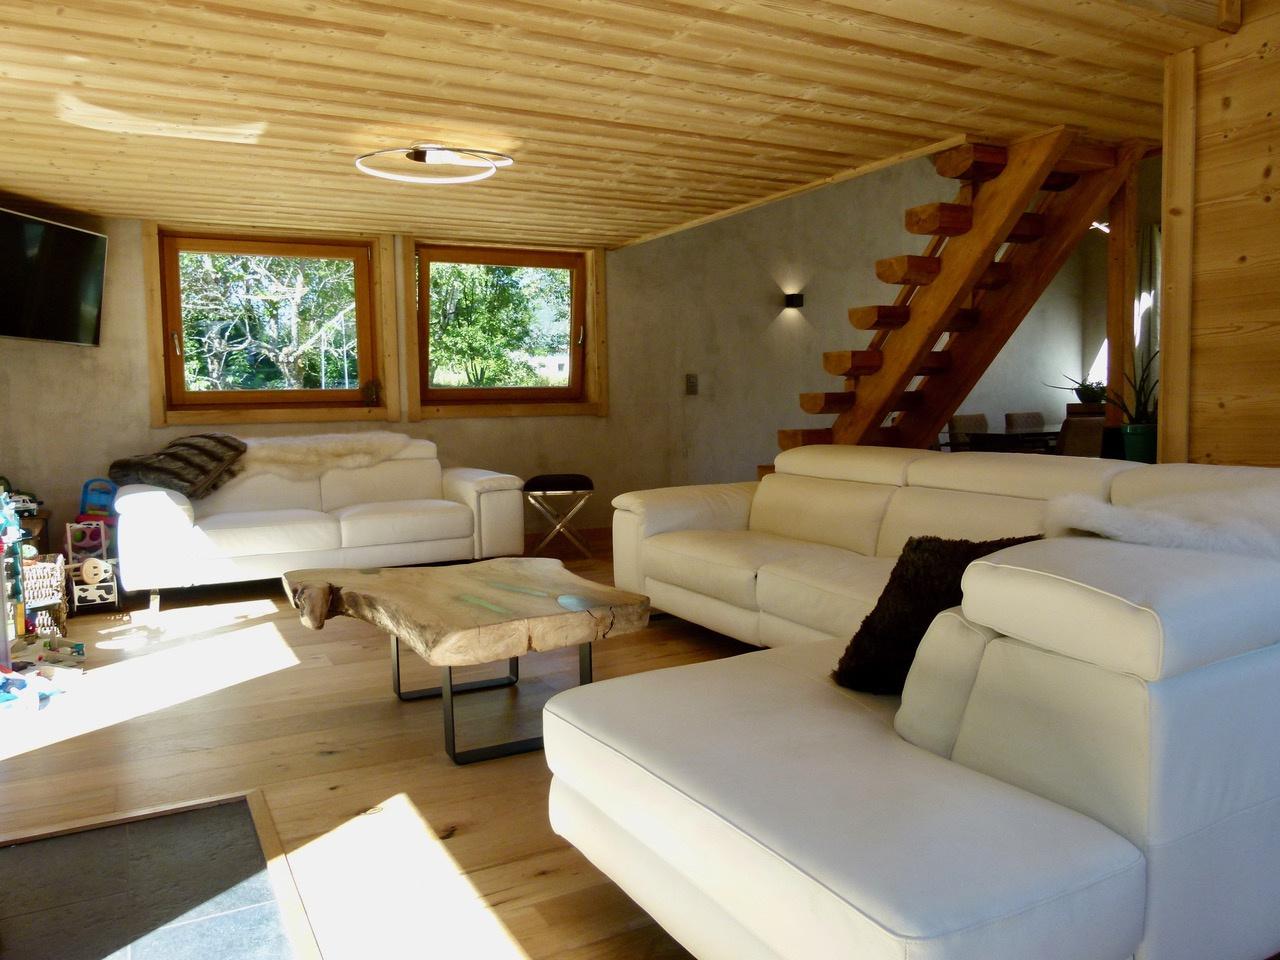 4 BEDROOM NEWBUILT CHALET IN CHAMONIX CENTER